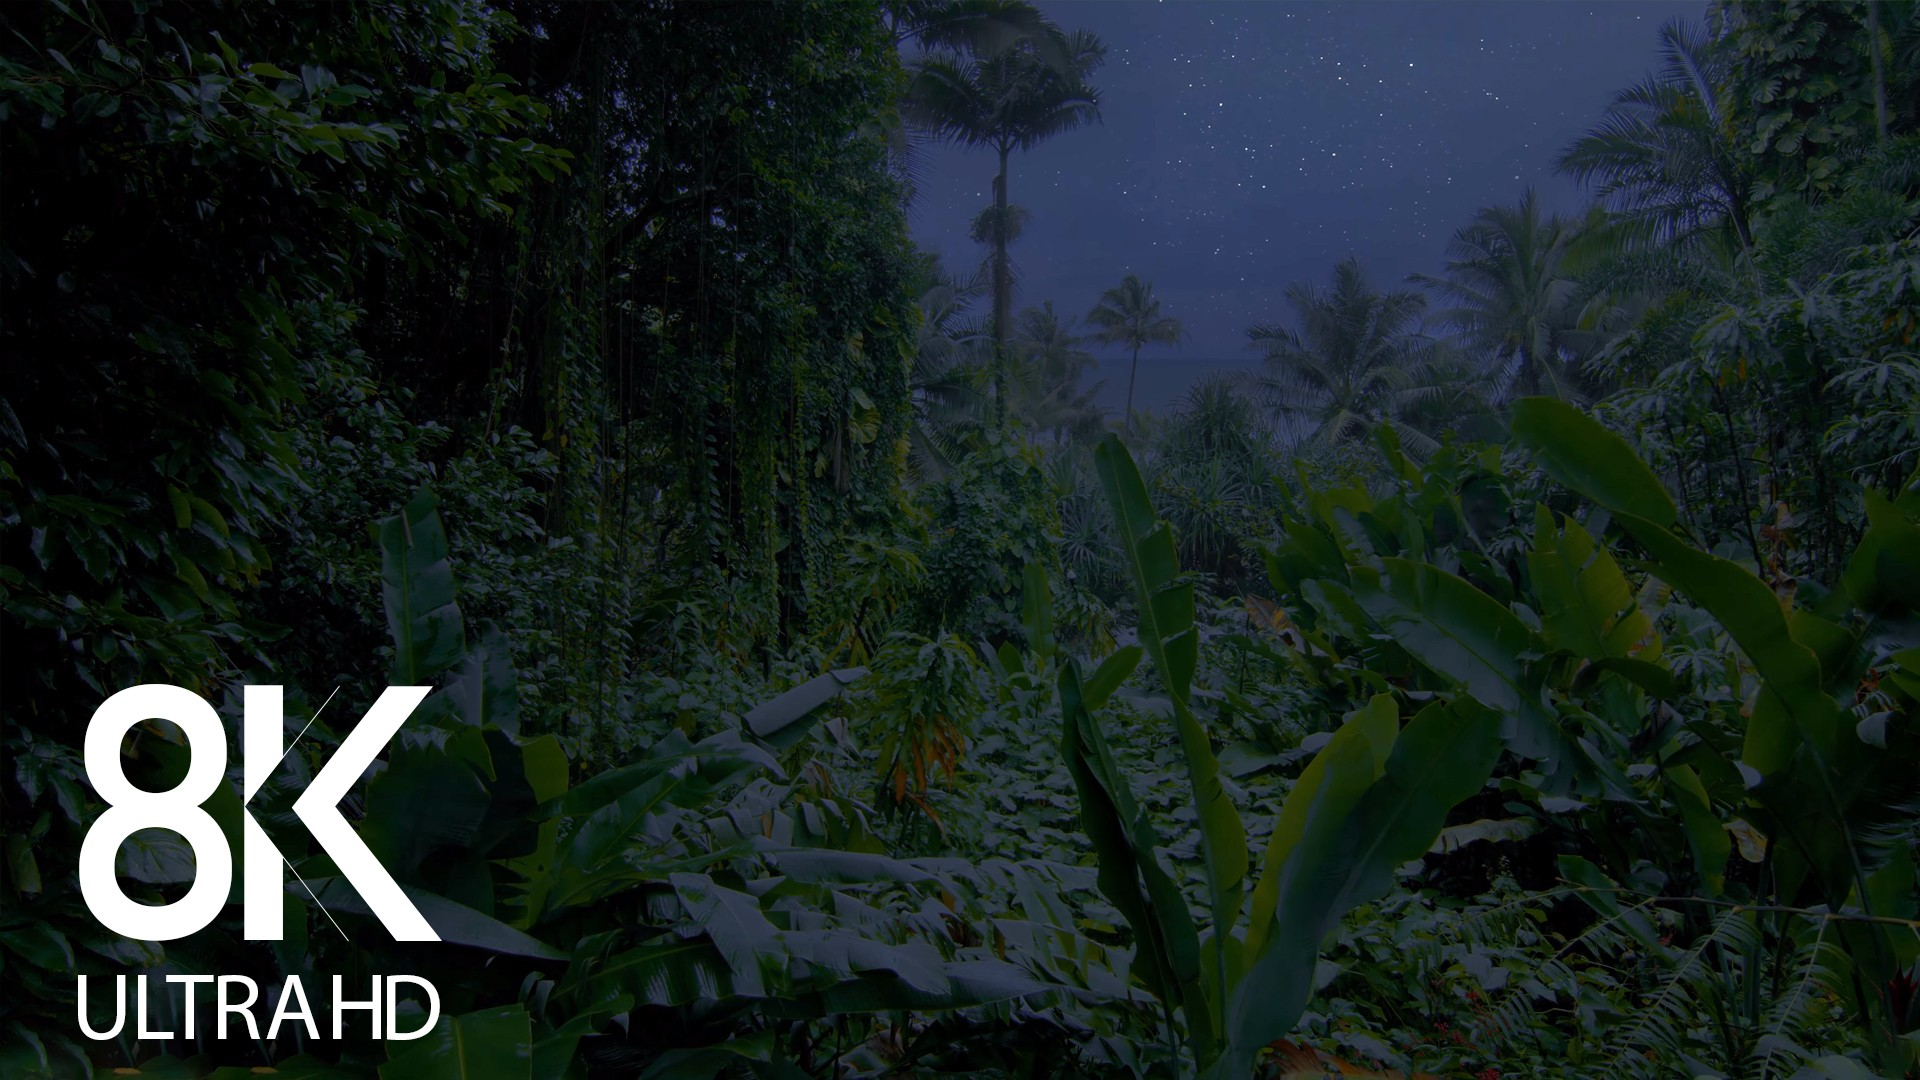 Jungle Nightlife Sounds Part 1